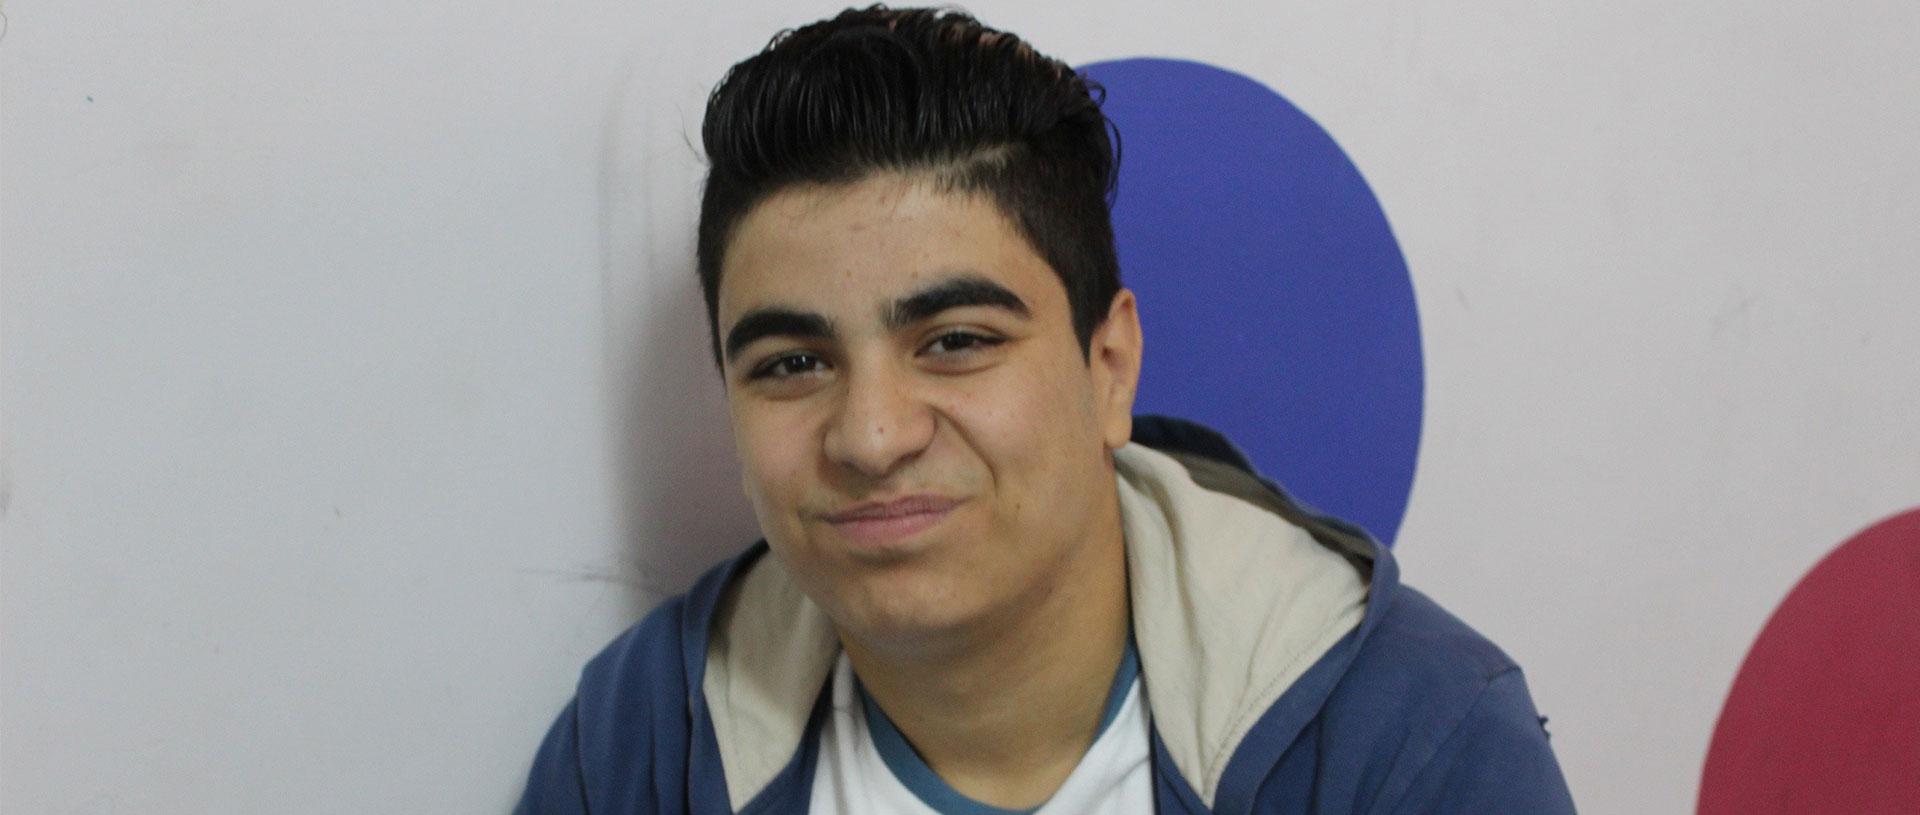 Ahmad starts a new life in Jordan banner